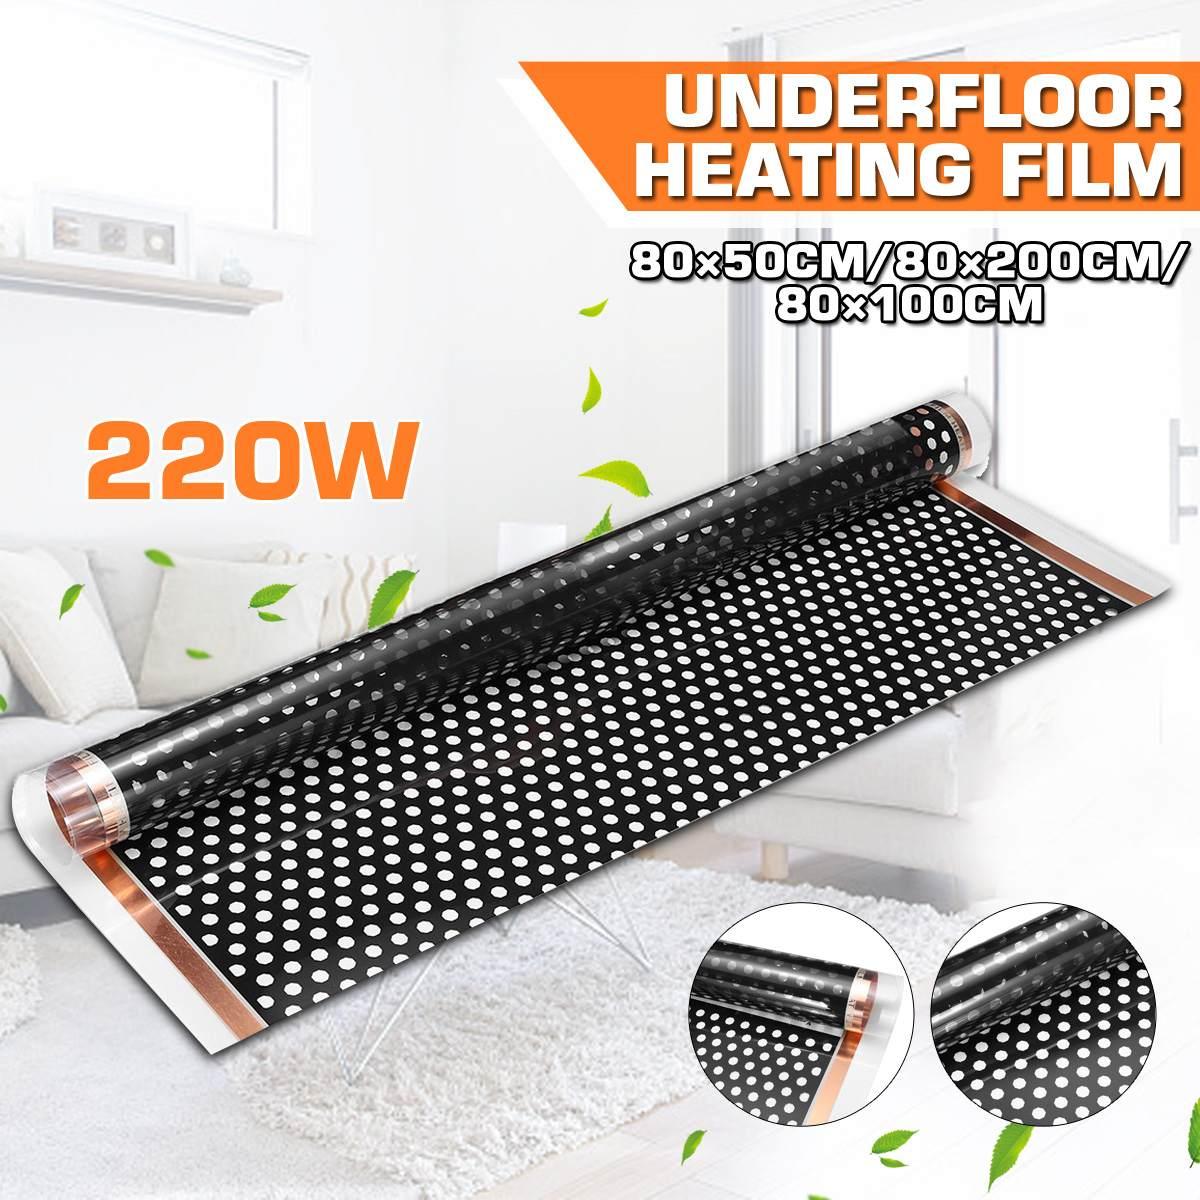 80x200cm 220W Infrared Warm Floor Heating Film Electric High Quality Carbon Fiber Electric Heating Mat Underfloor Heating Film